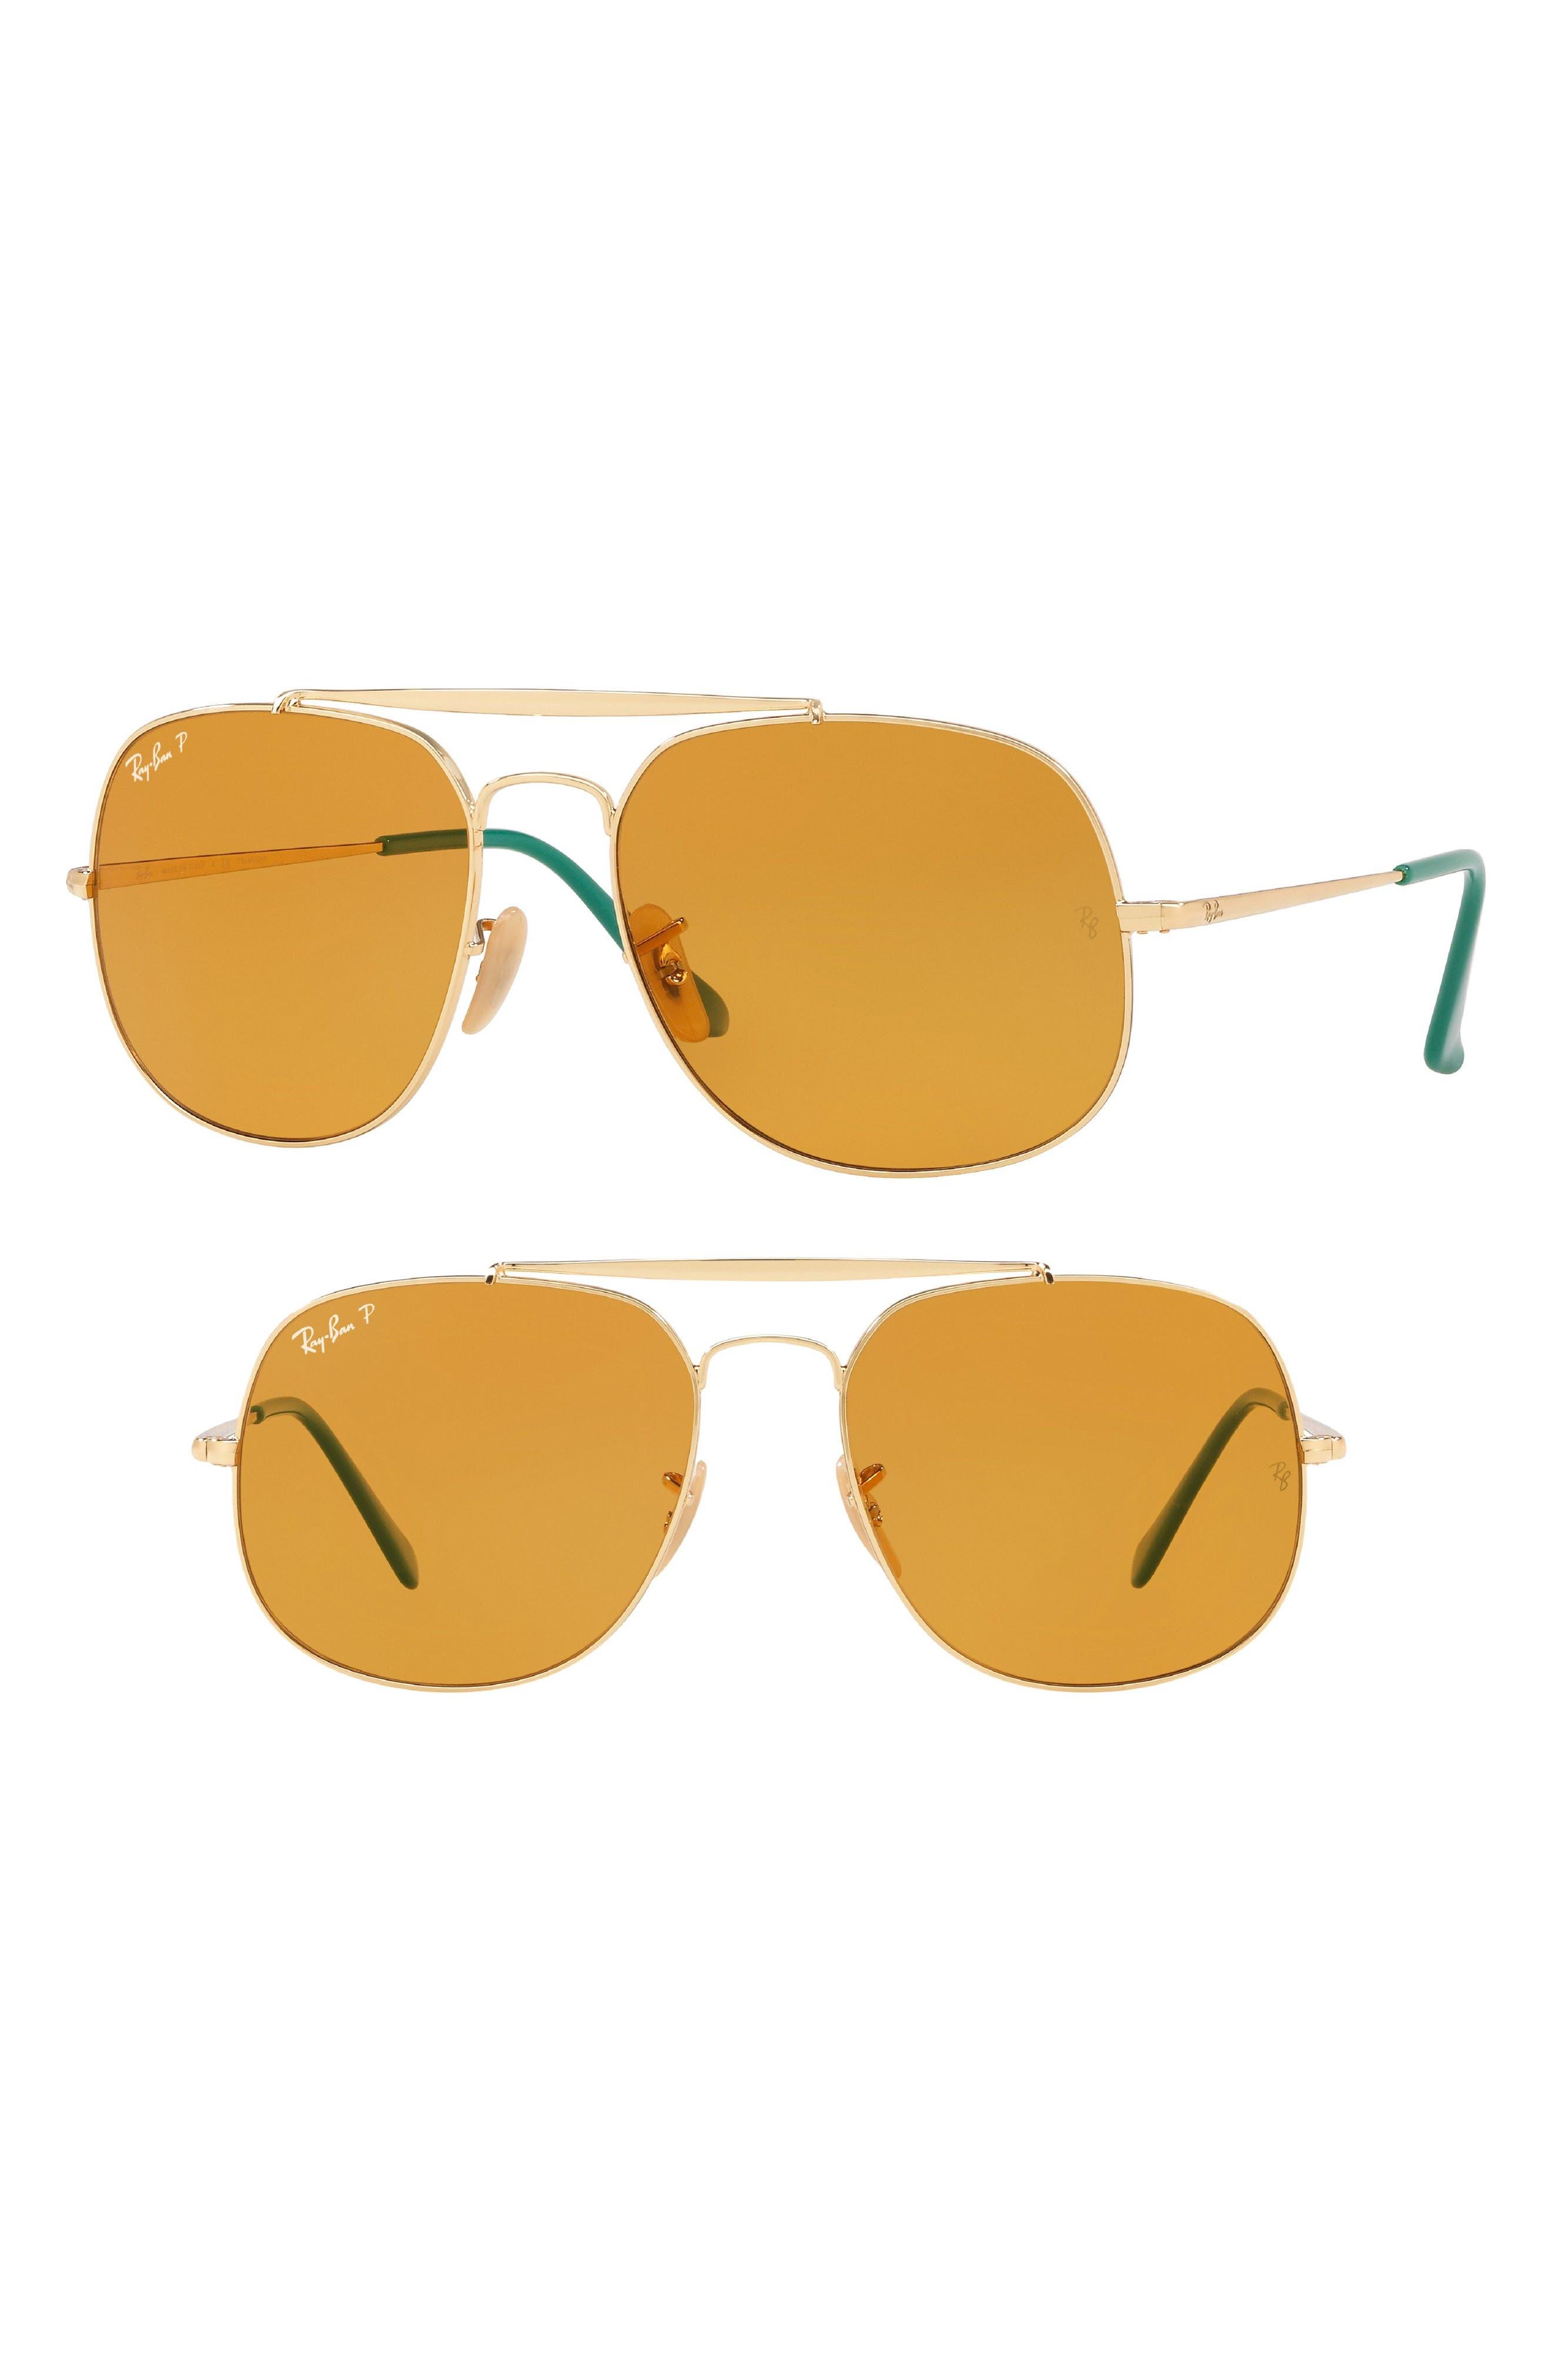 57mm Polarized Aviator Sunglasses,                         Main,                         color, Gold